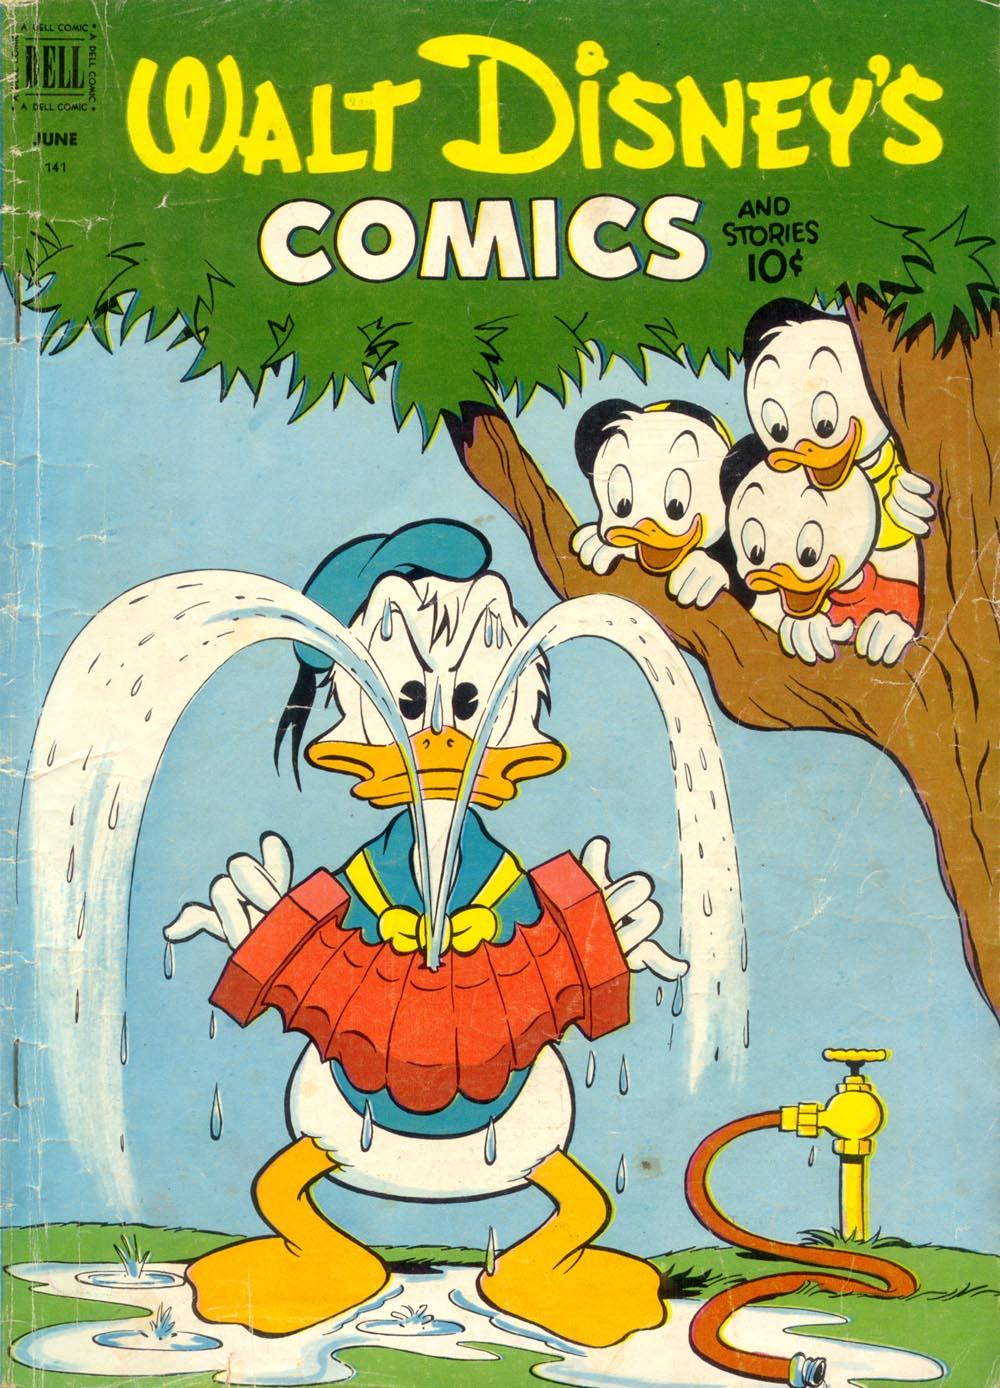 Walt Disneys Comics and Stories 141 Page 1